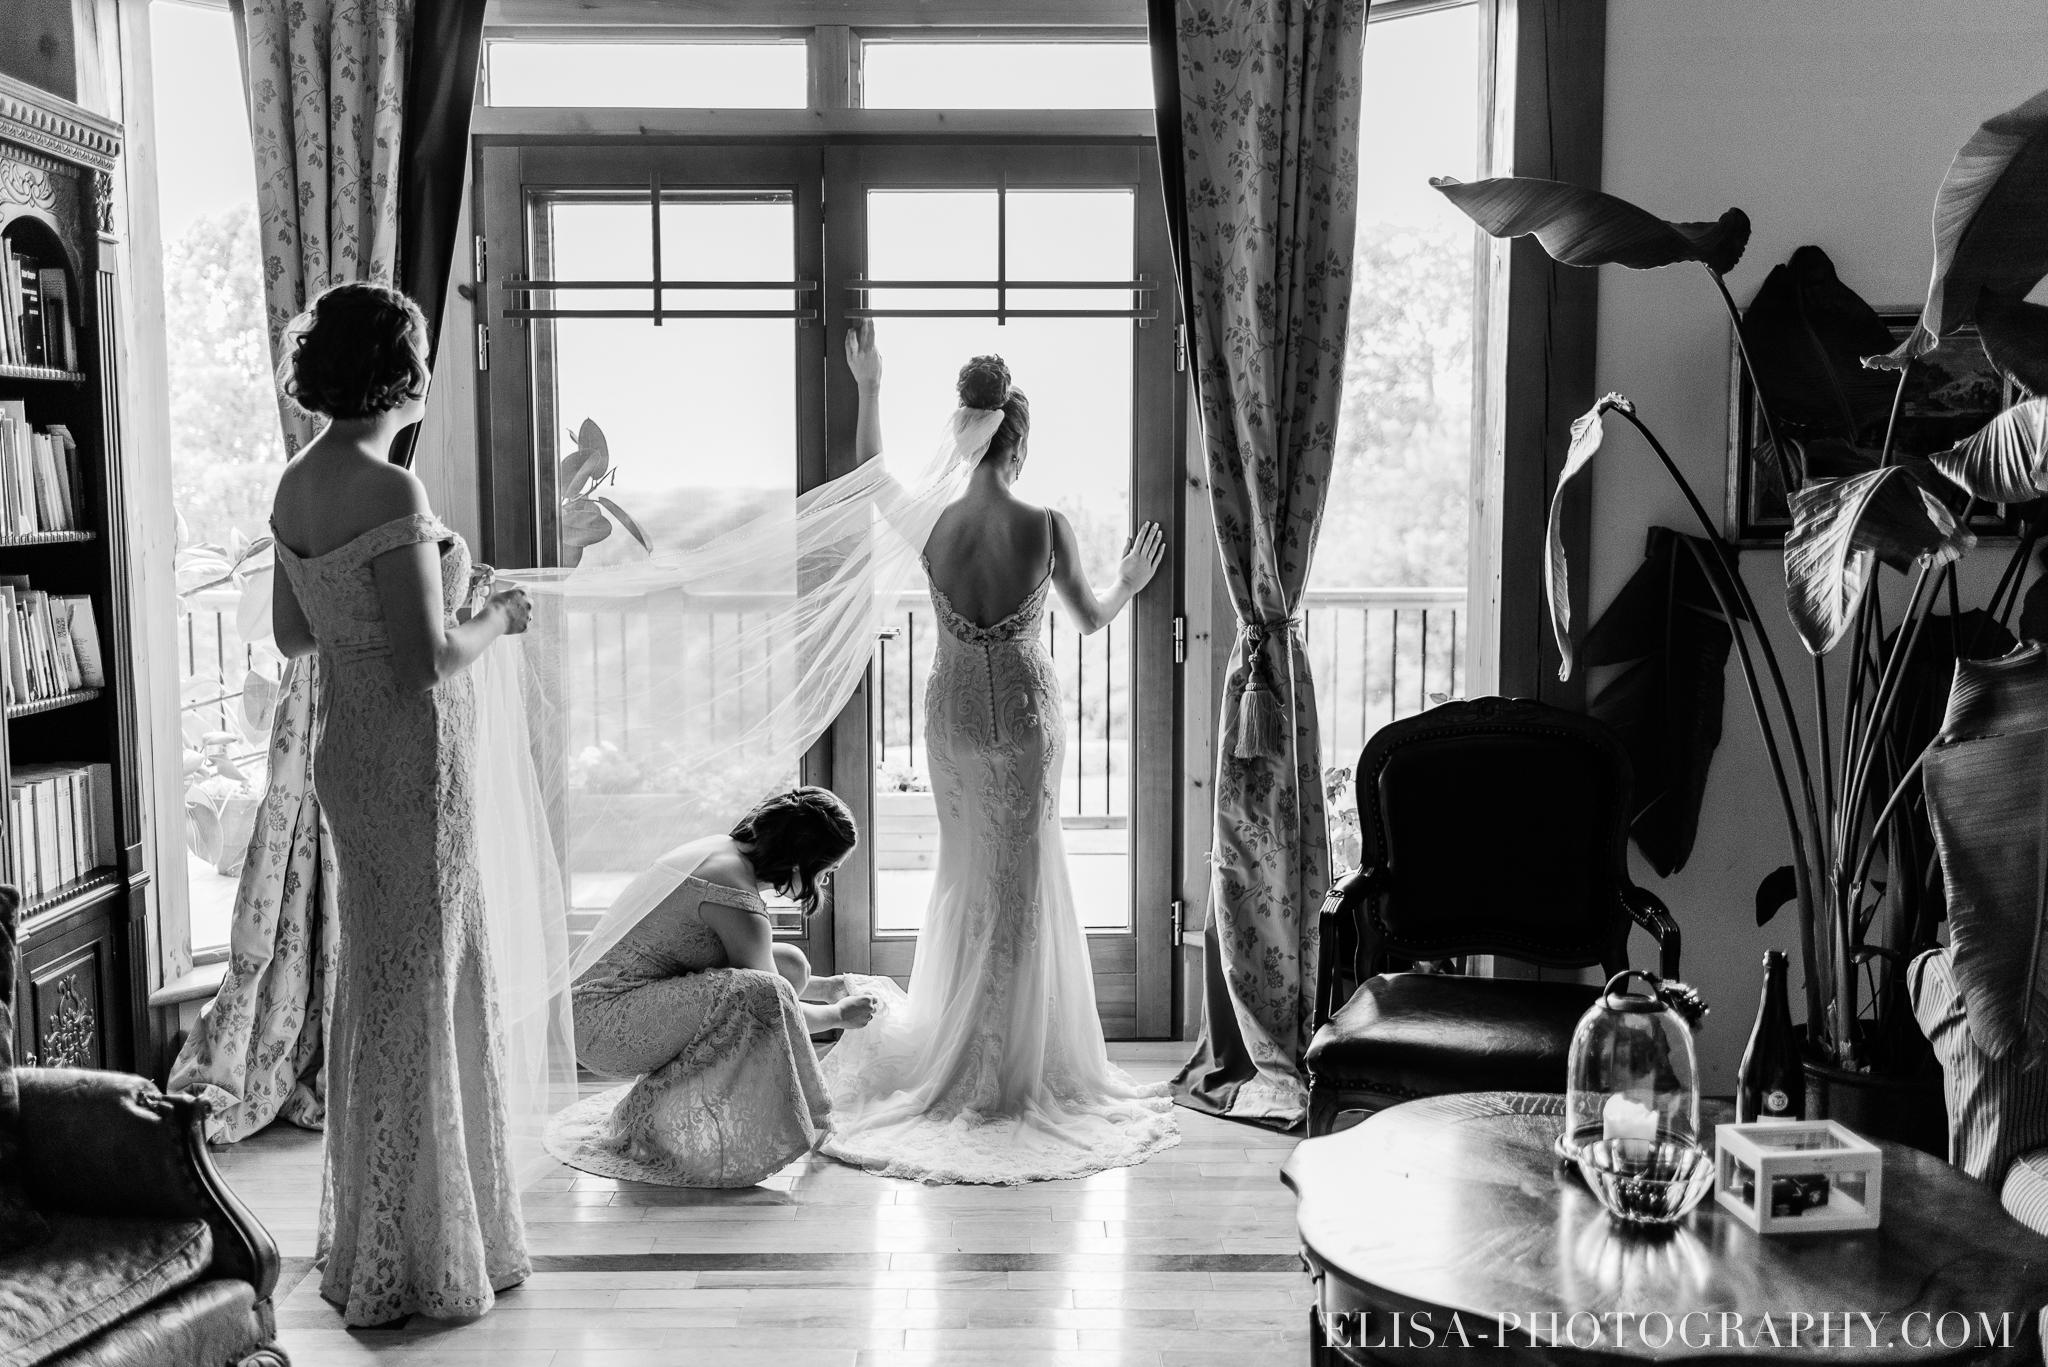 photo mariage domaine tomali maniatin maquillage papa mariee preparatifs 5811 - Mariage à la montagne au domaine Tomali-Maniatyn